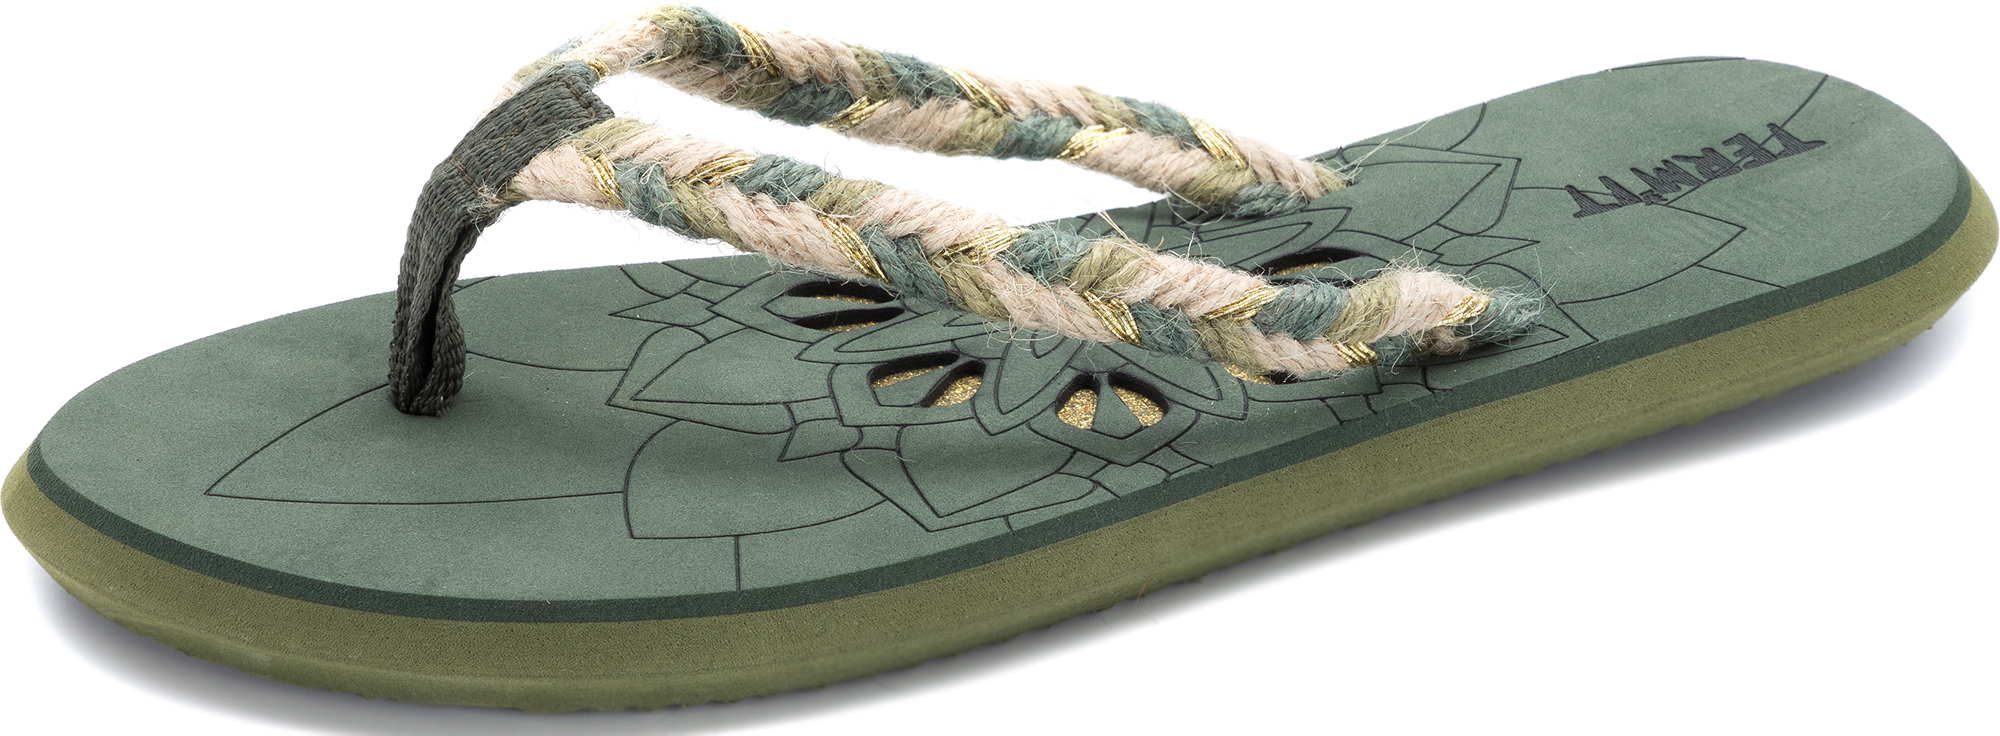 Termit Шлепанцы женские Termit Fancy, размер 40